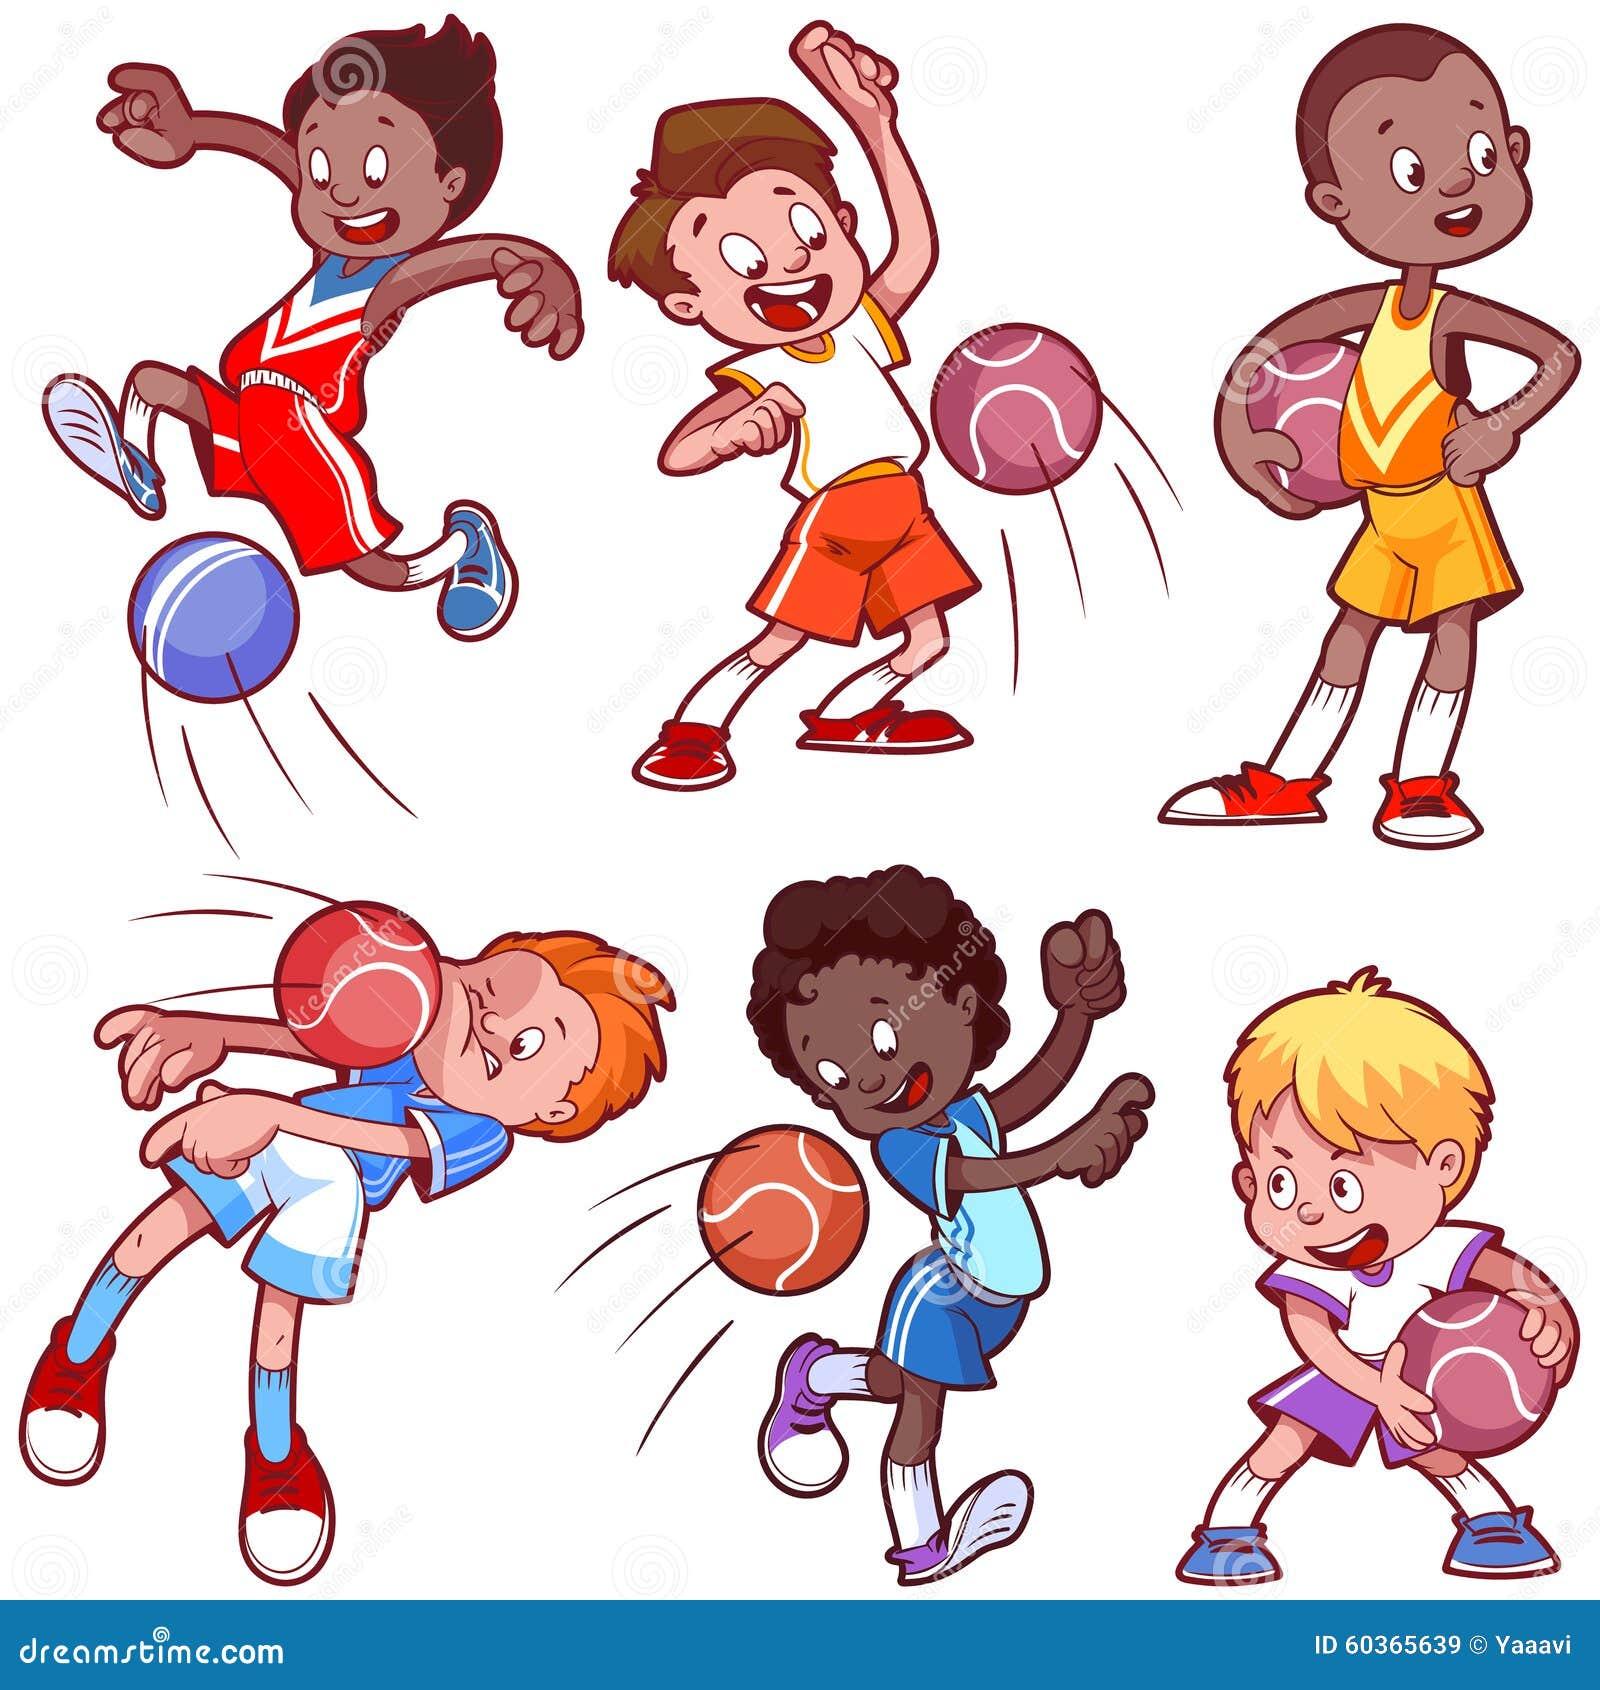 Cartoon Kids Playing Dodgeball. Stock Vector - Illustration of game, dodgeball: 60365639